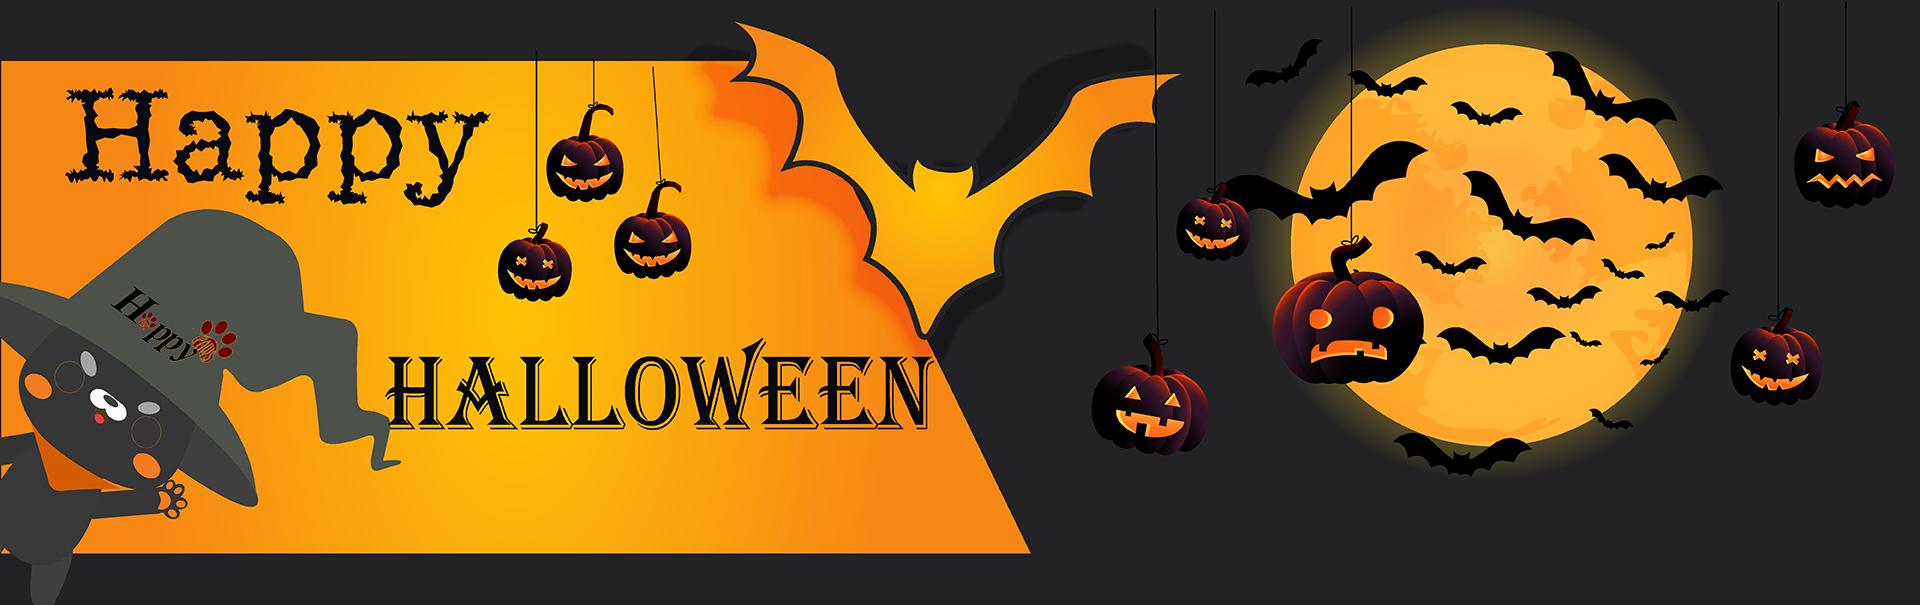 halloweenfinal1-01-01